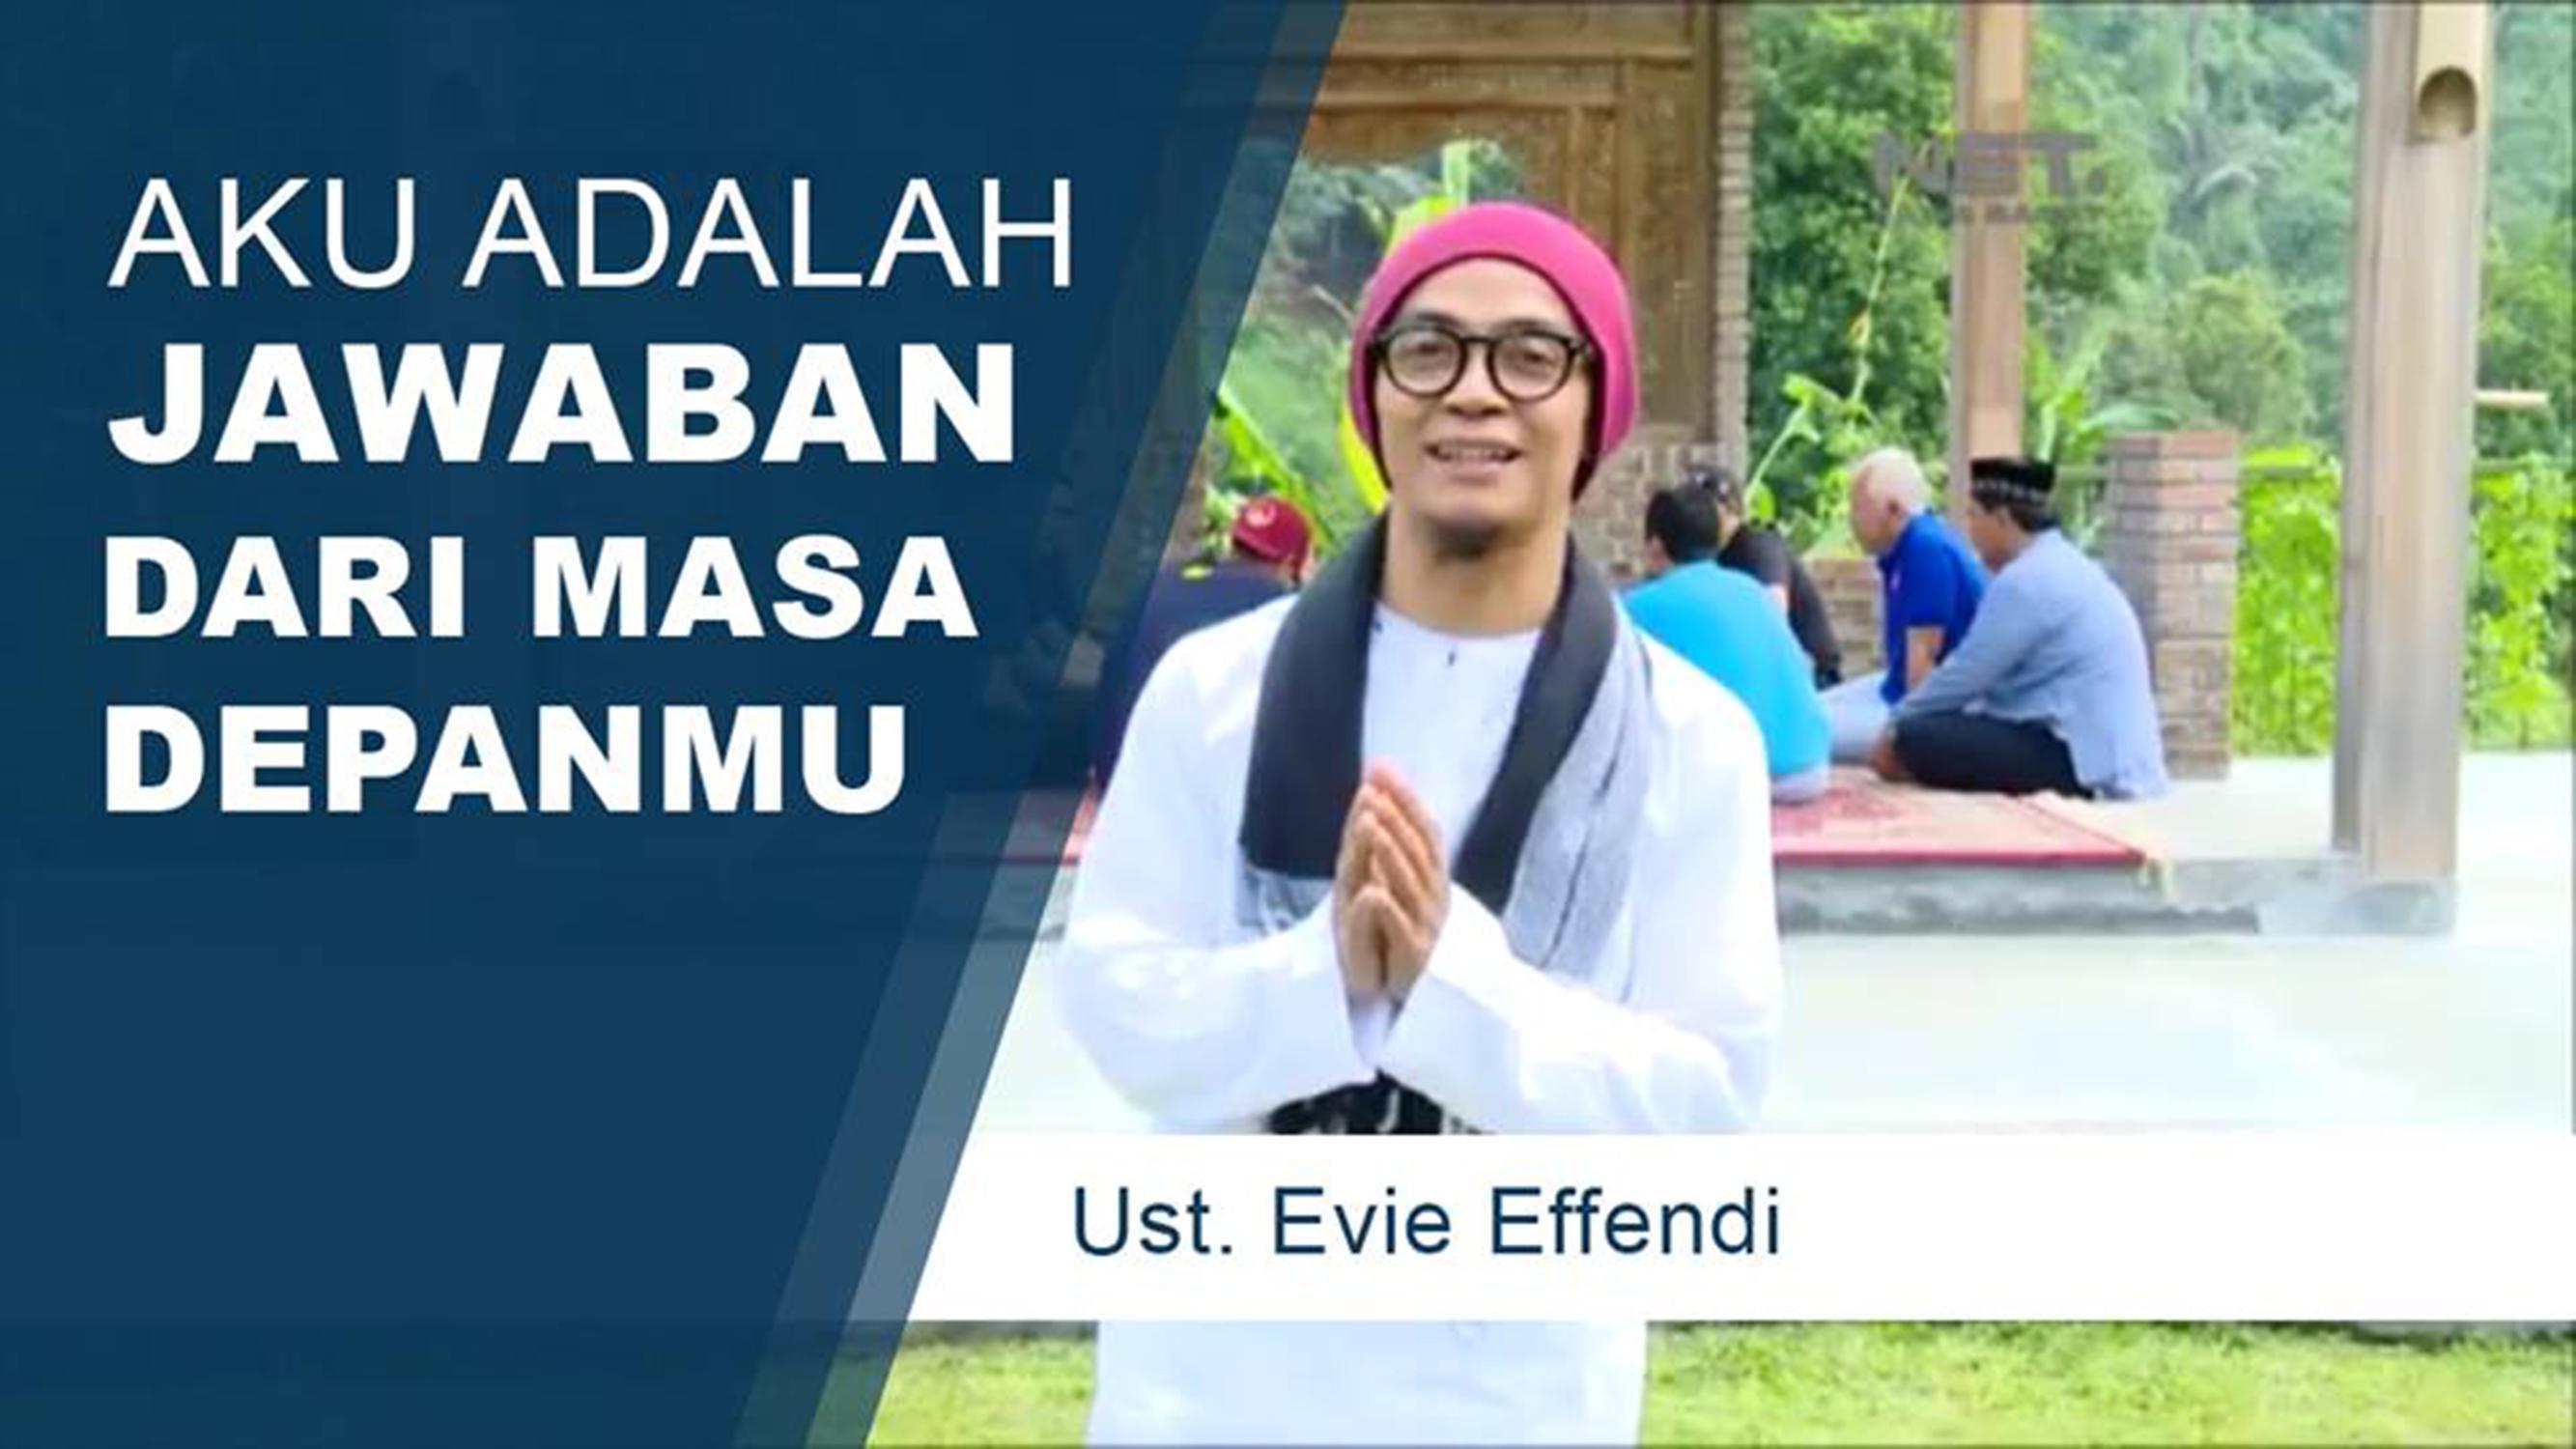 Kumpulan Ceramah Ust Evie Effendi For Android APK Download